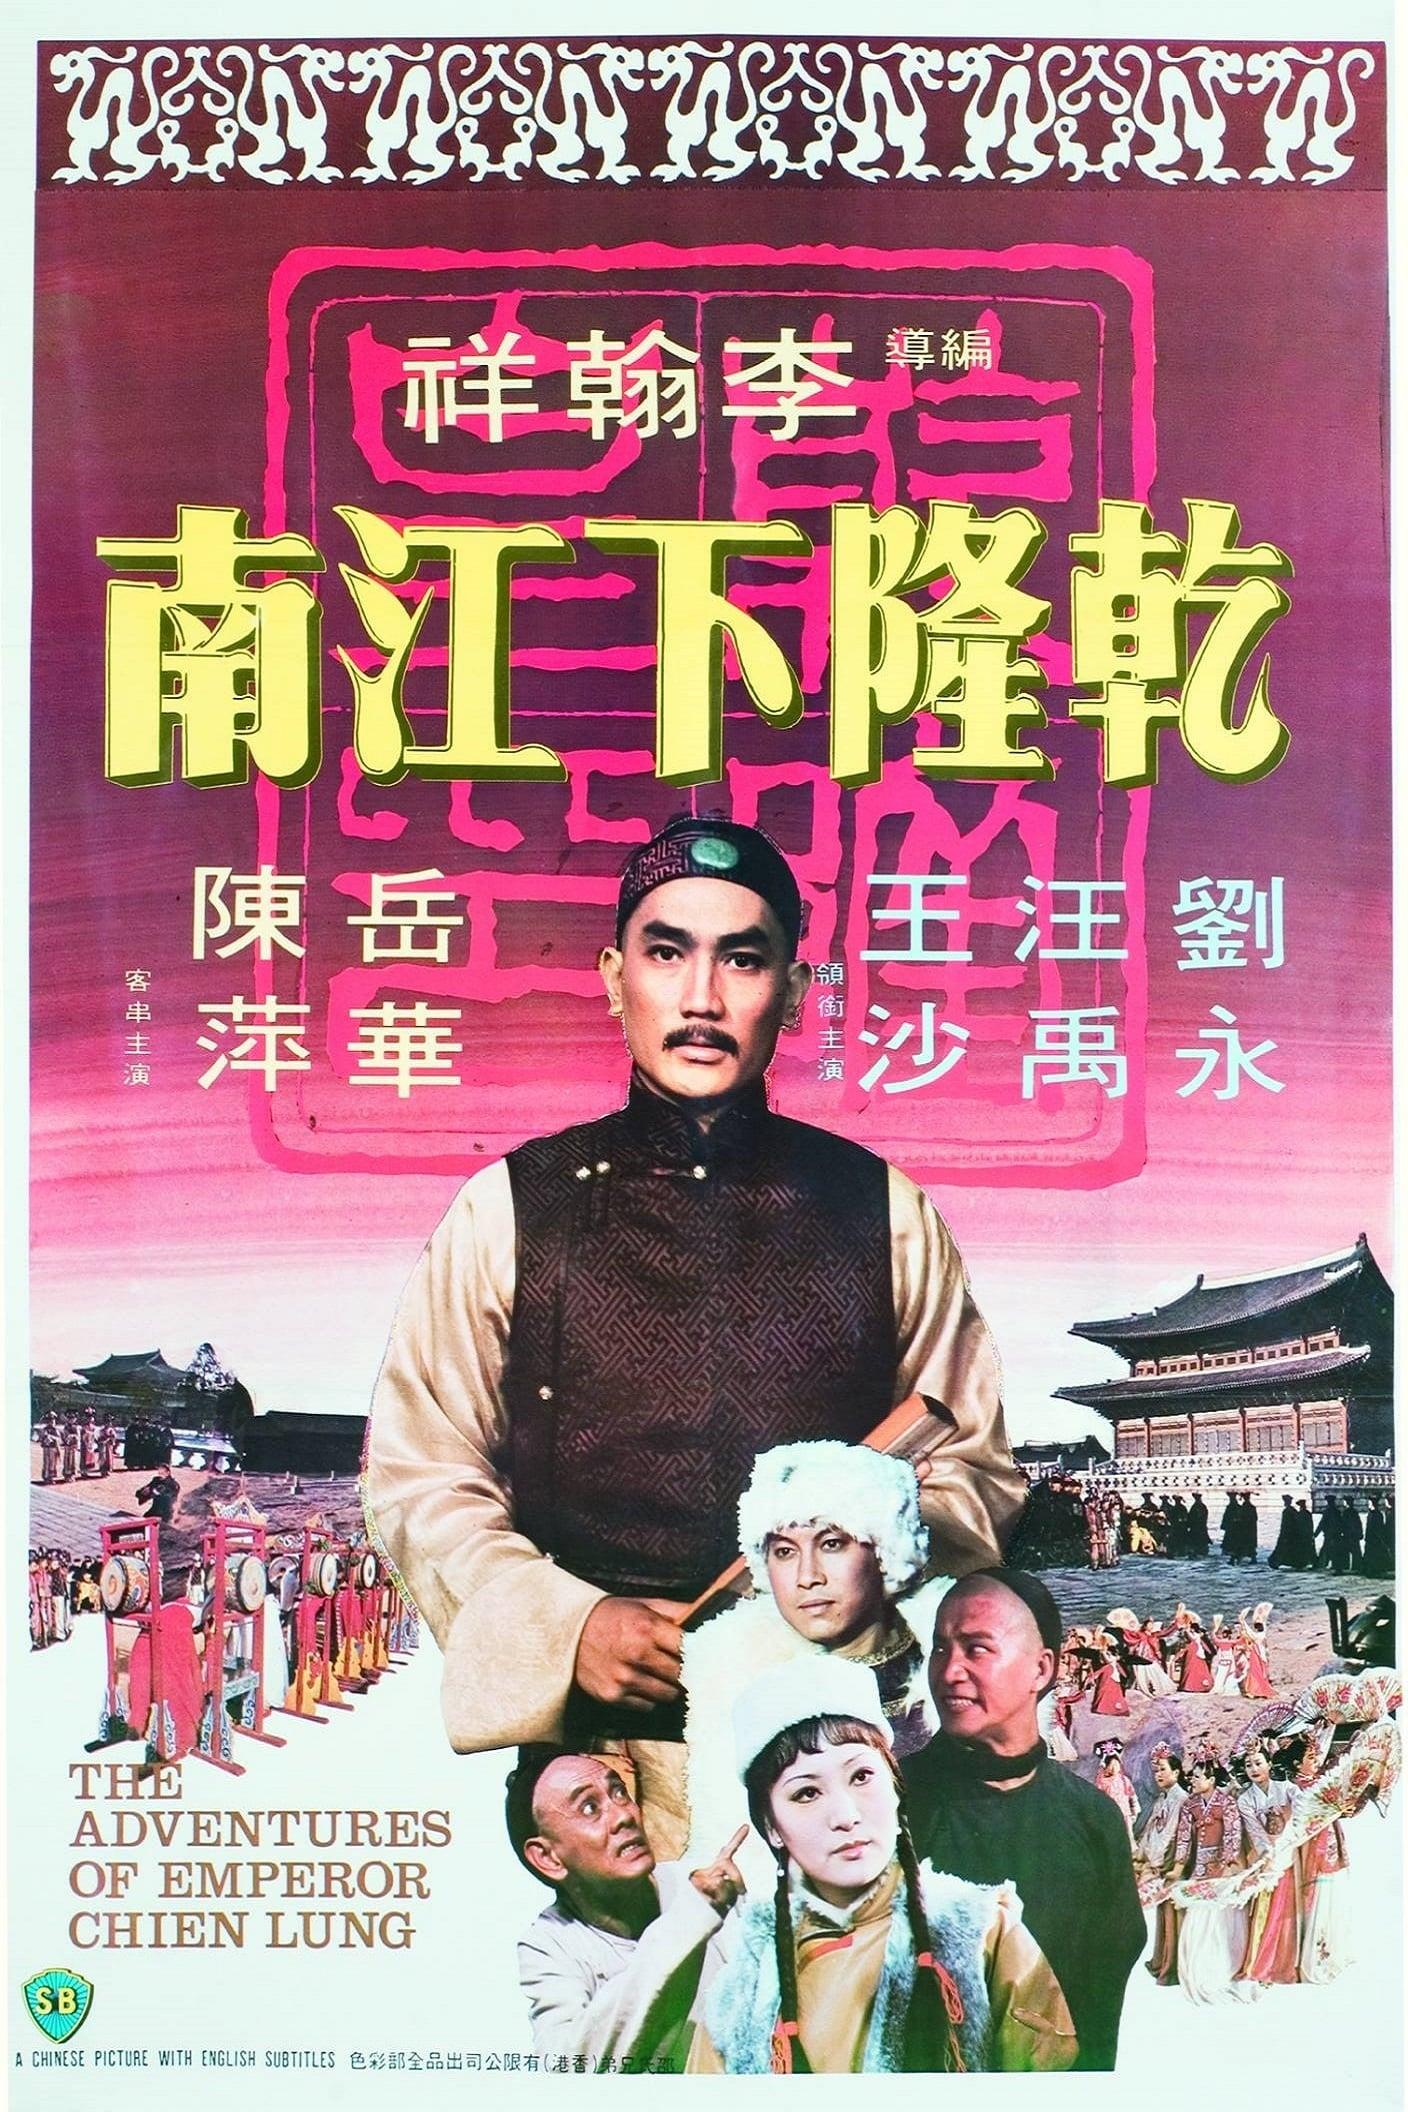 The Adventures of Emperor Chien Lung (1977)